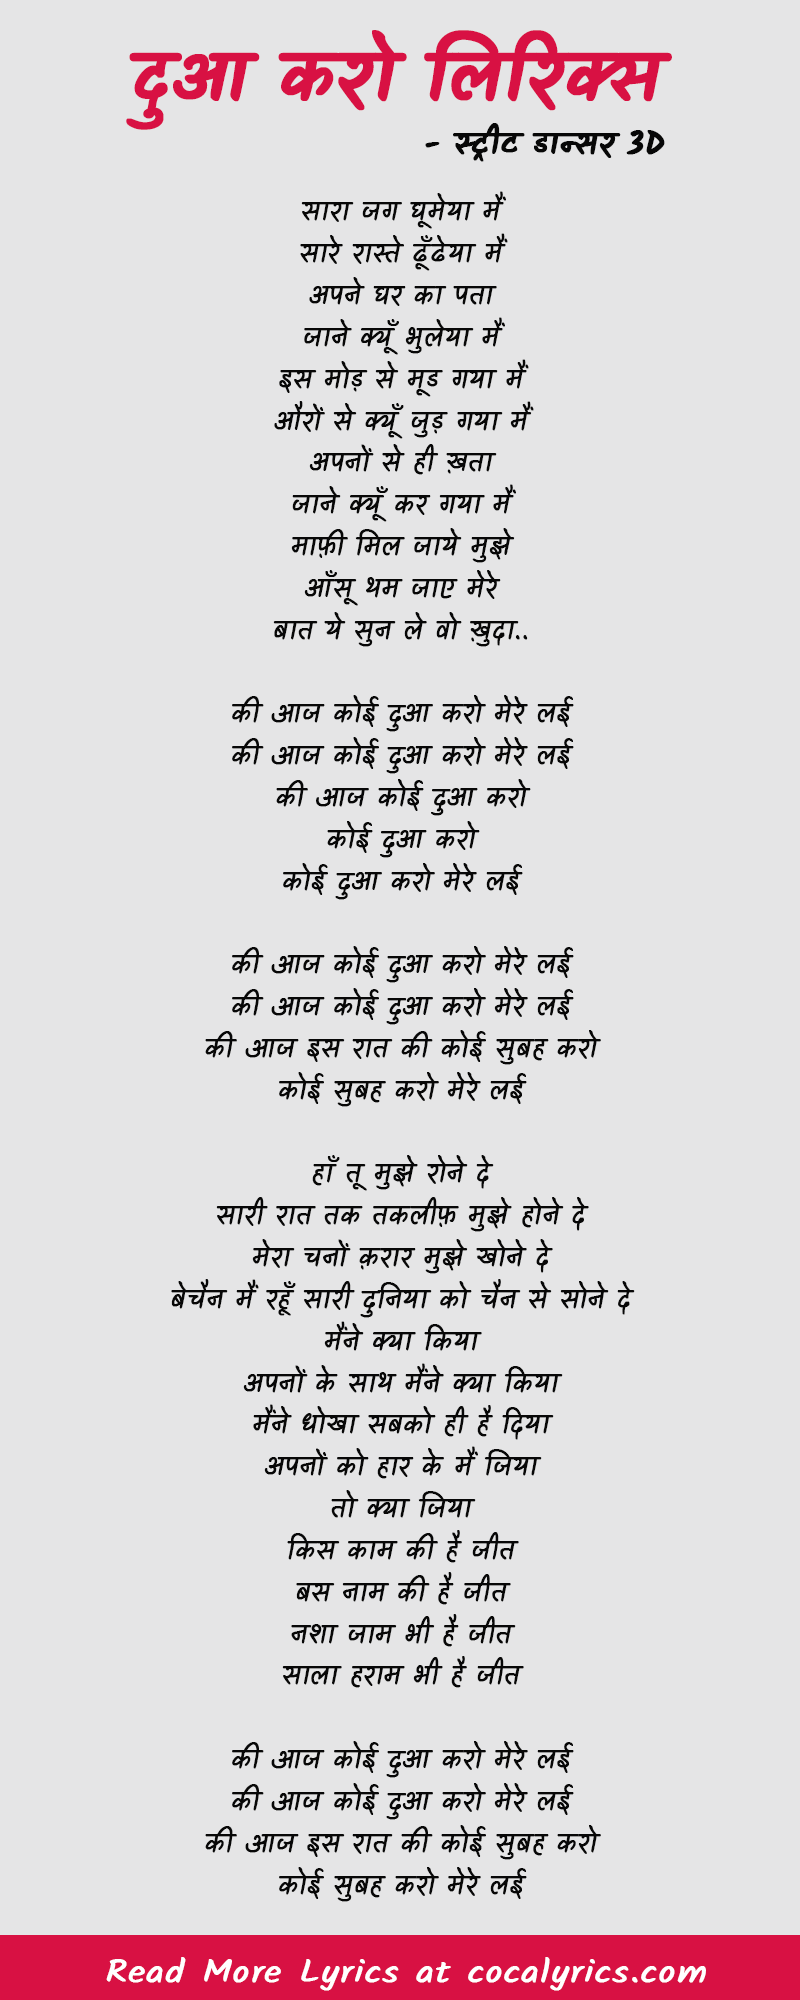 Dua Karo Lyrics In Hindi Street Dancer 3d In 2020 Lyrics Hindi Movie Song Movie Songs Notes & sargam the best website for sargam notations of hindi songs english songs indian regional songs and popular tunes. dua karo lyrics in hindi street